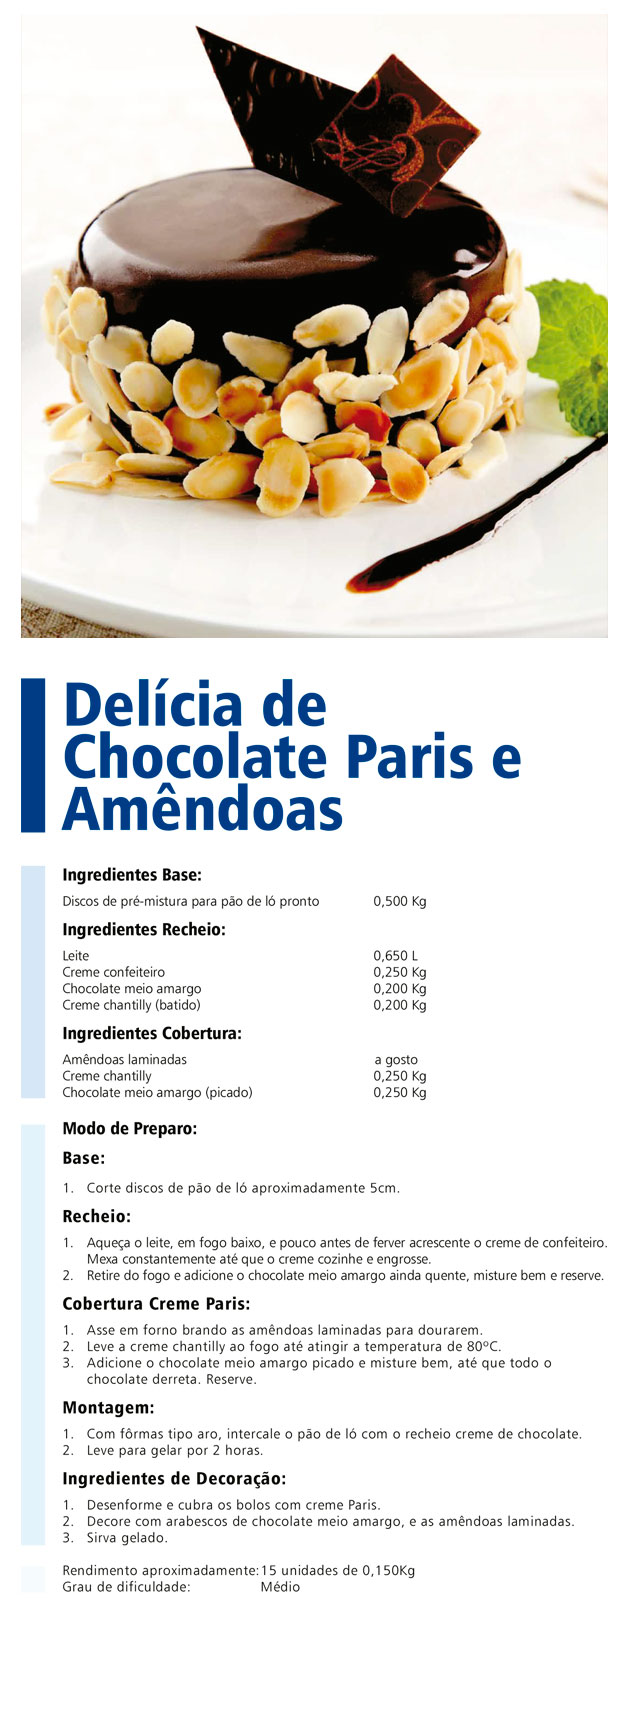 delicia-de-chocolate-paris-e-amendoas